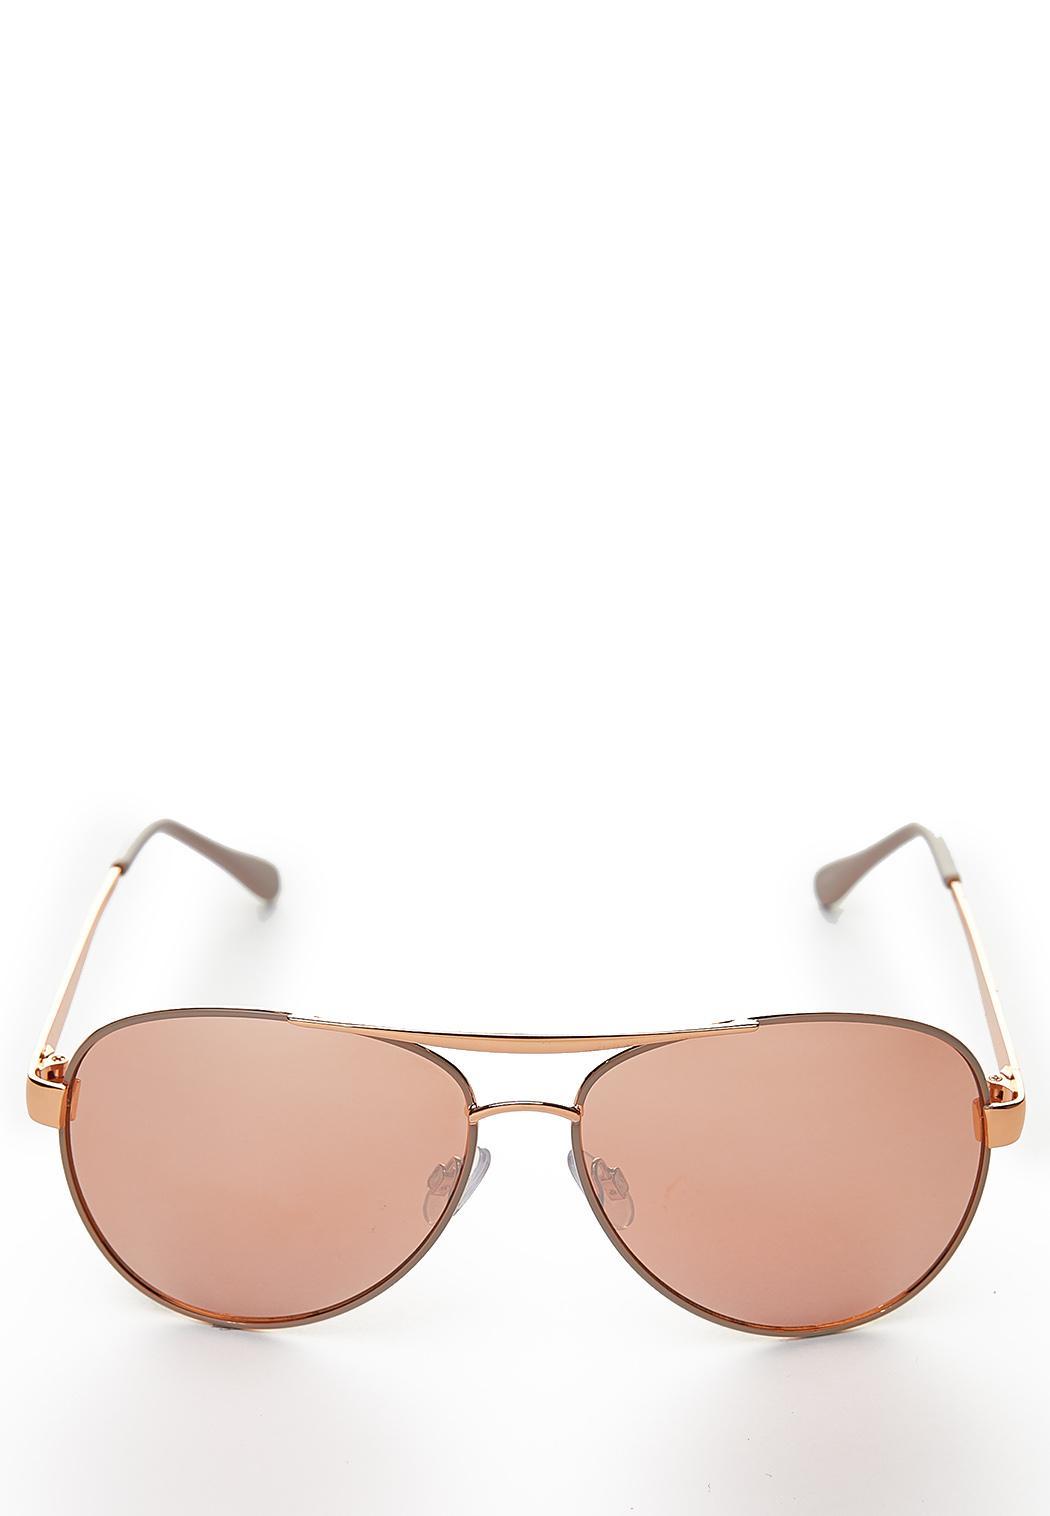 5e15bcbe96843 Rose Gold Aviator Sunglasses Sunglasses Cato Fashions